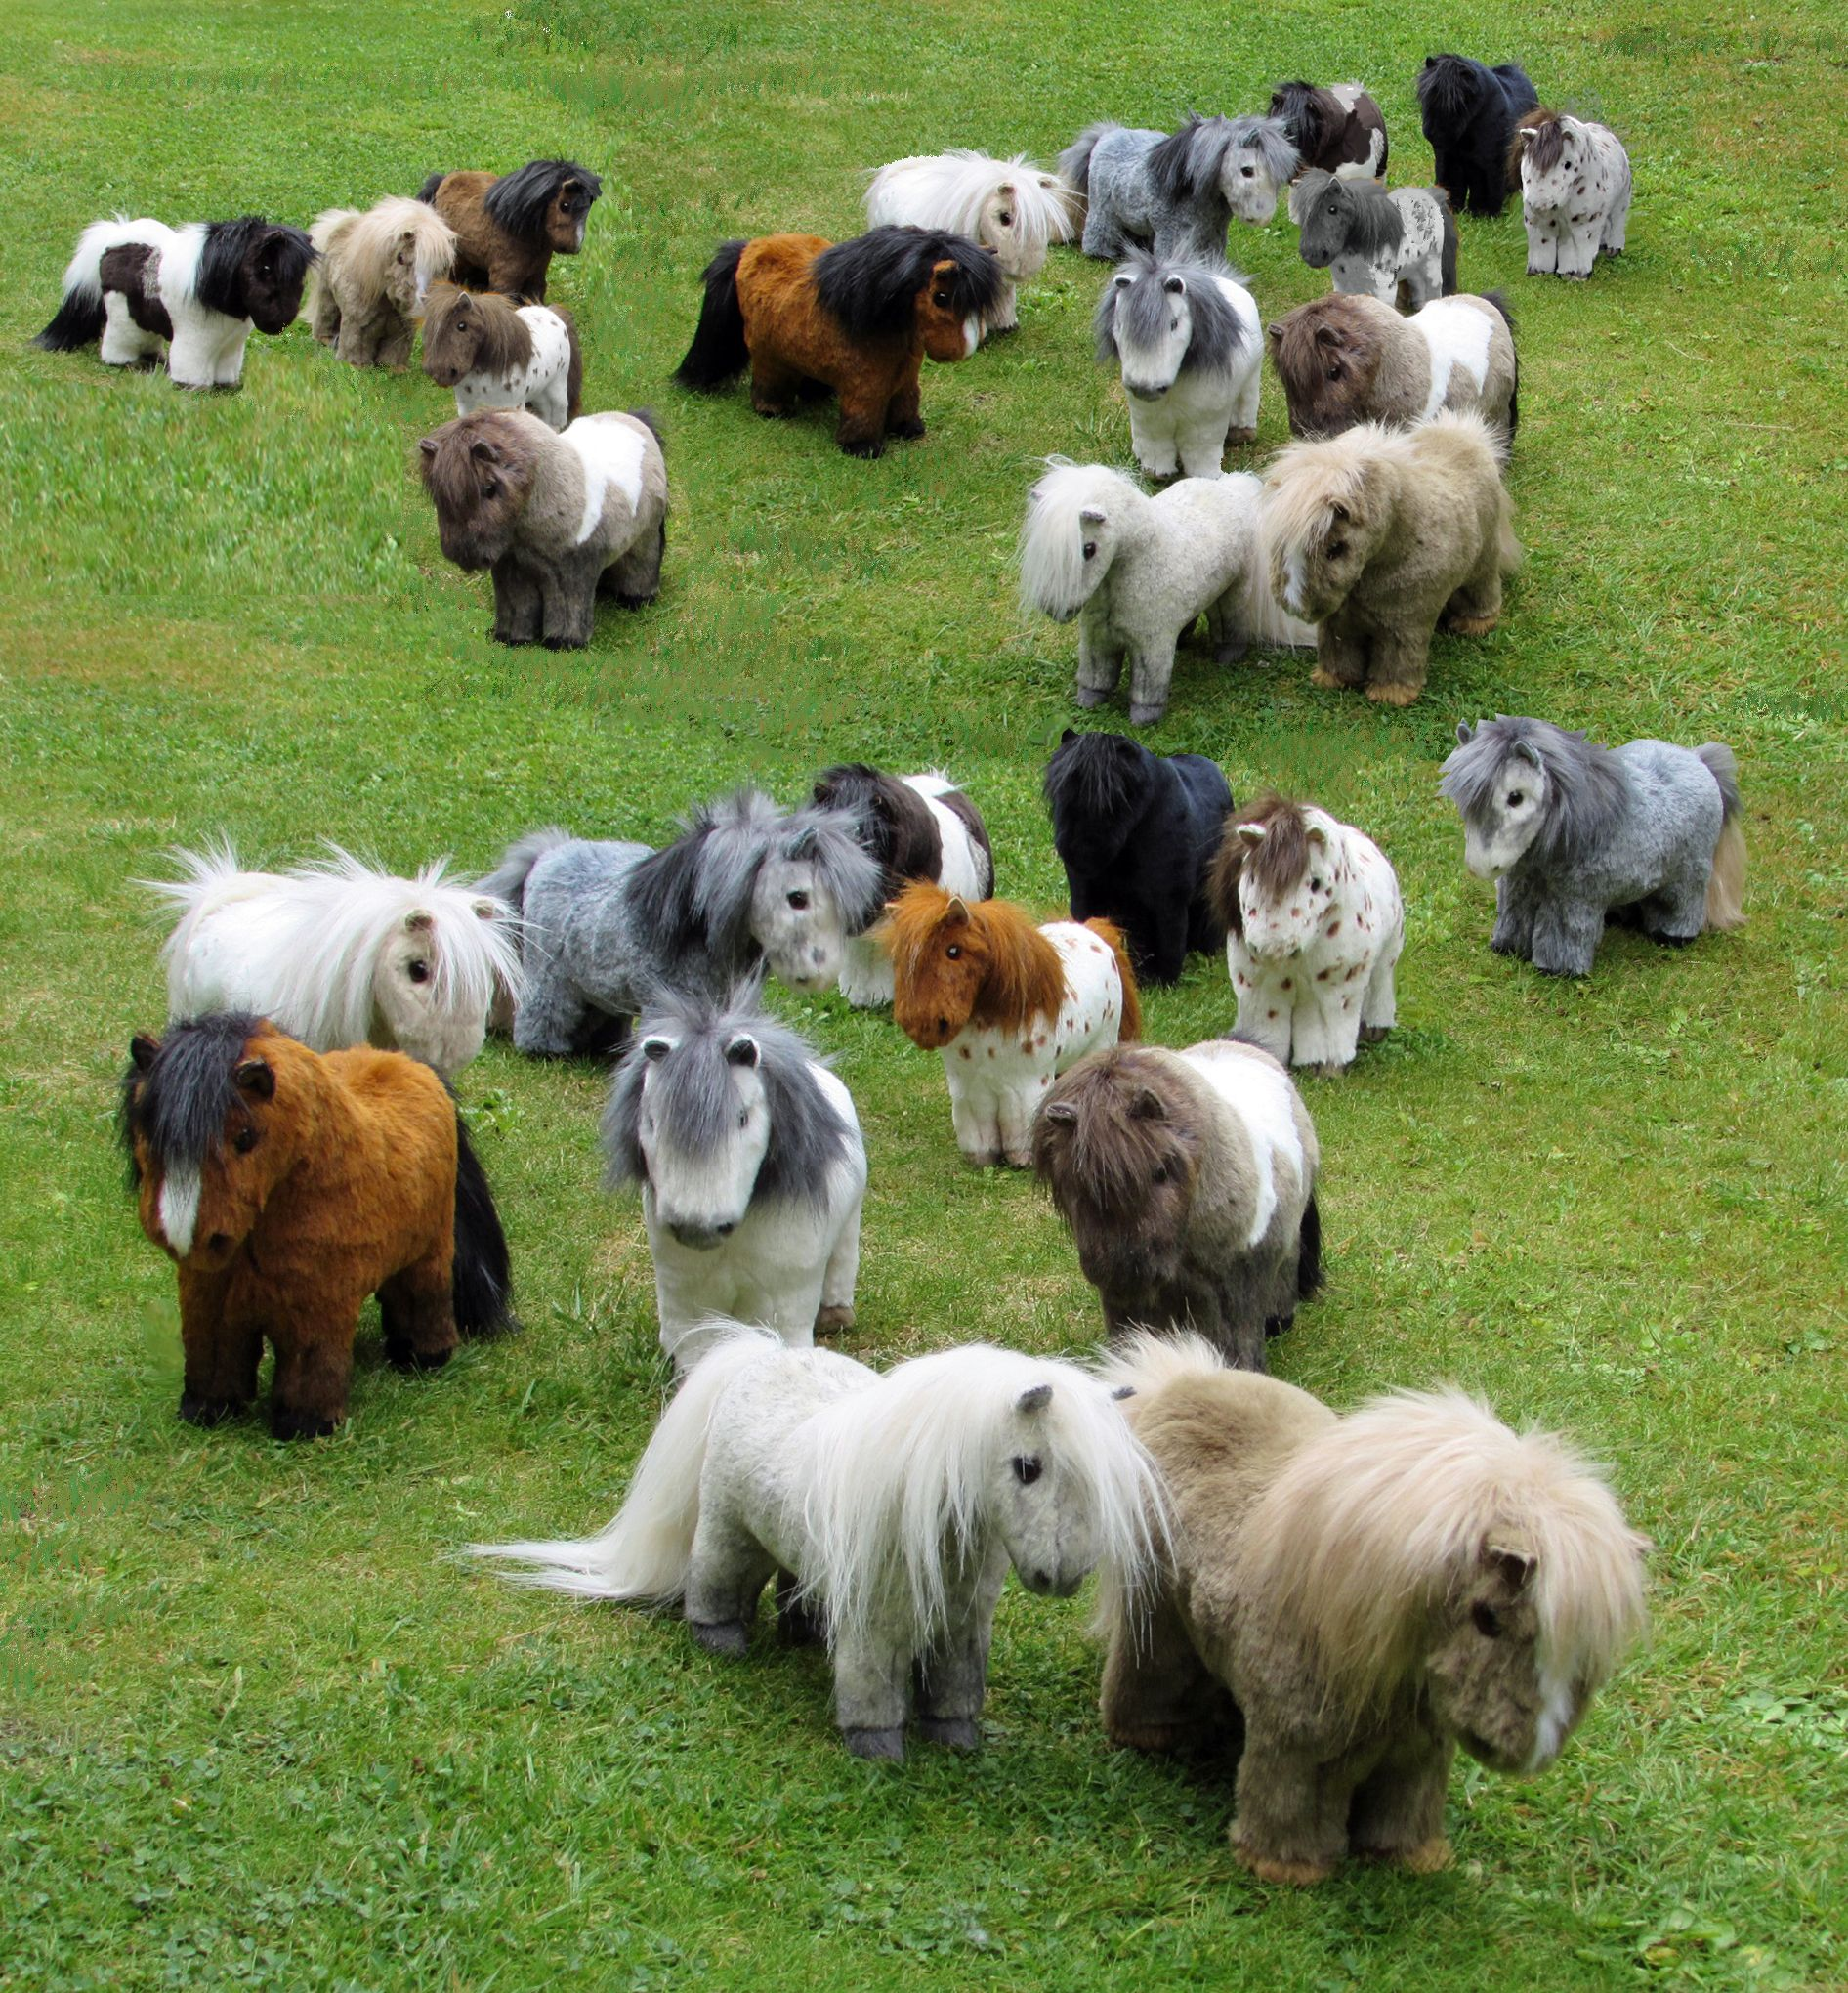 Cute Ponies, Cute Horses, Sheep Dog Puppy